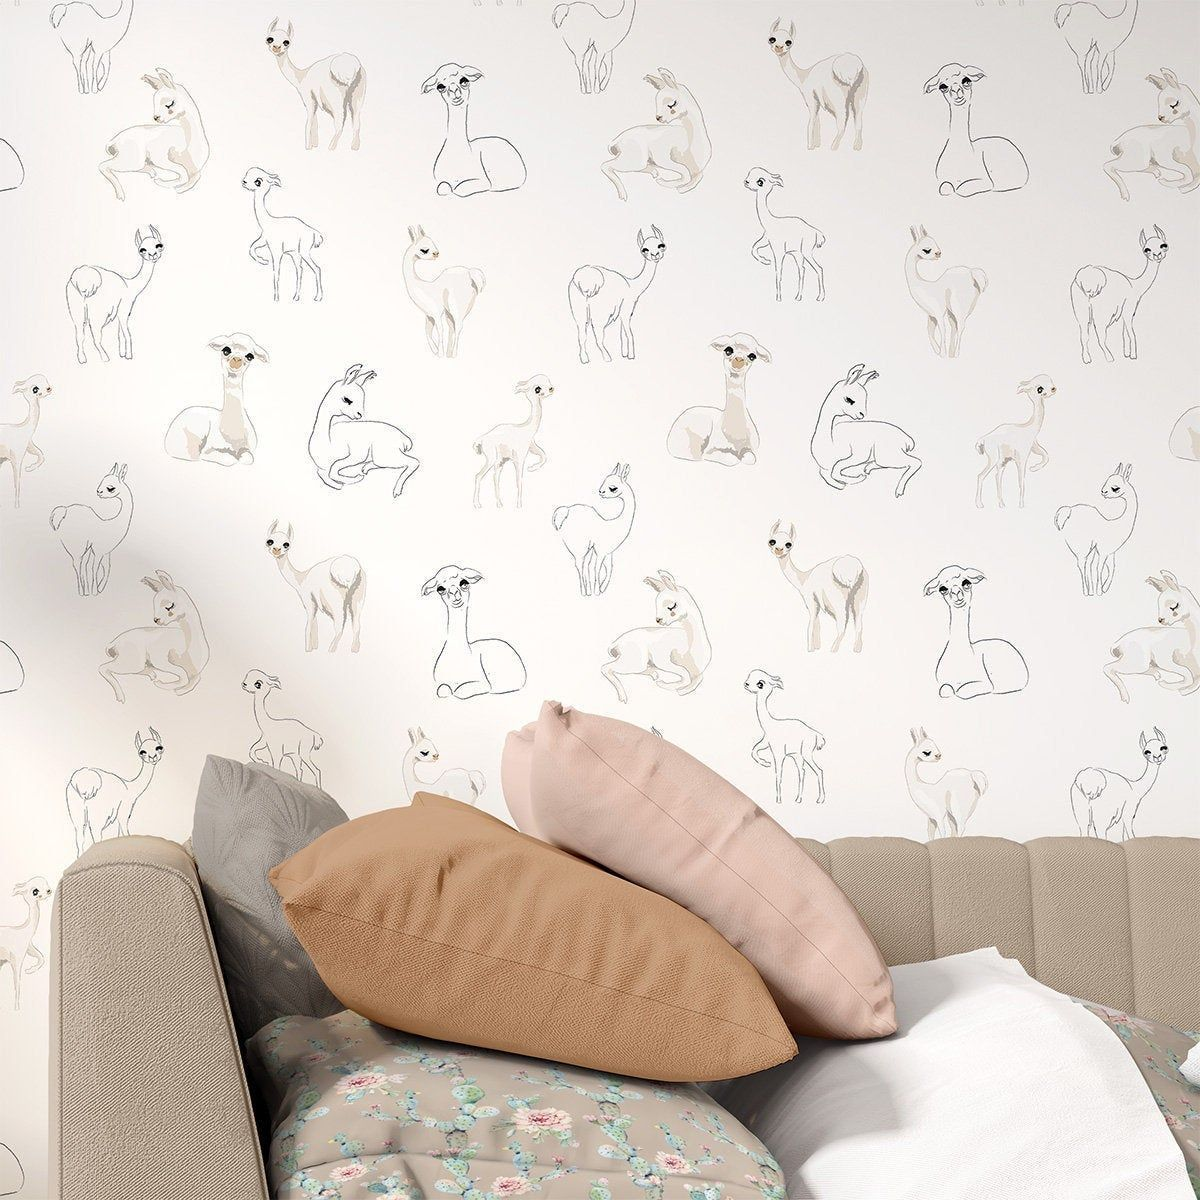 Gender Neutral Llama Wallpaper For Kids Bedroom Feature Wall Etsy Bedroom Etsy Feature Gender Feature Wall Bedroom Peel And Stick Wallpaper Kids Bedroom